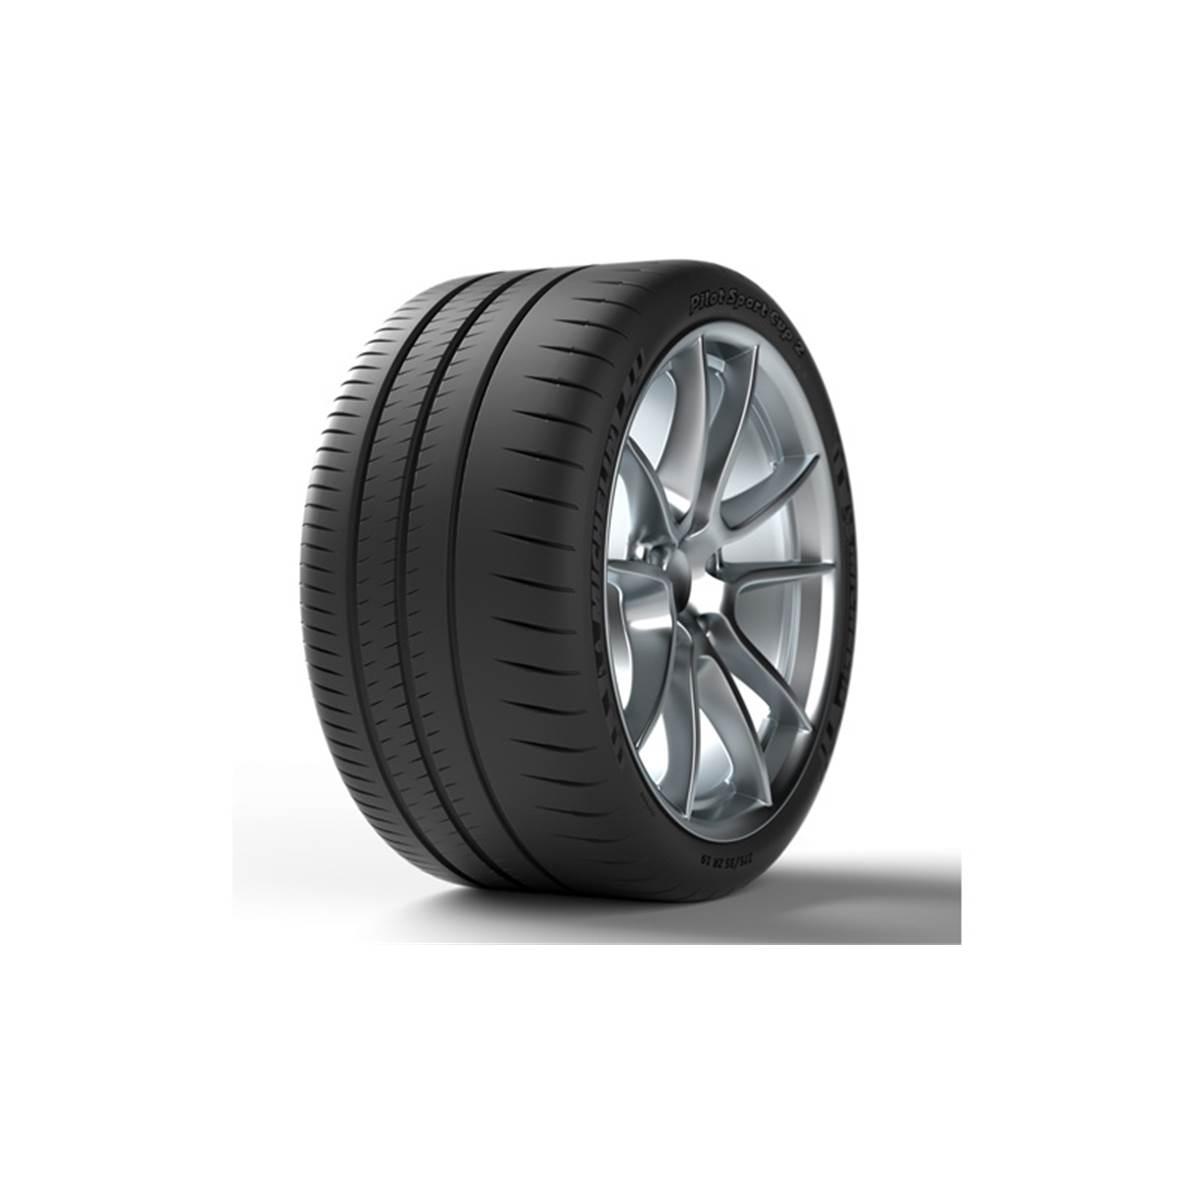 Pneu Michelin 325/30R19 105Y Pilot Sport Cup 2 XL